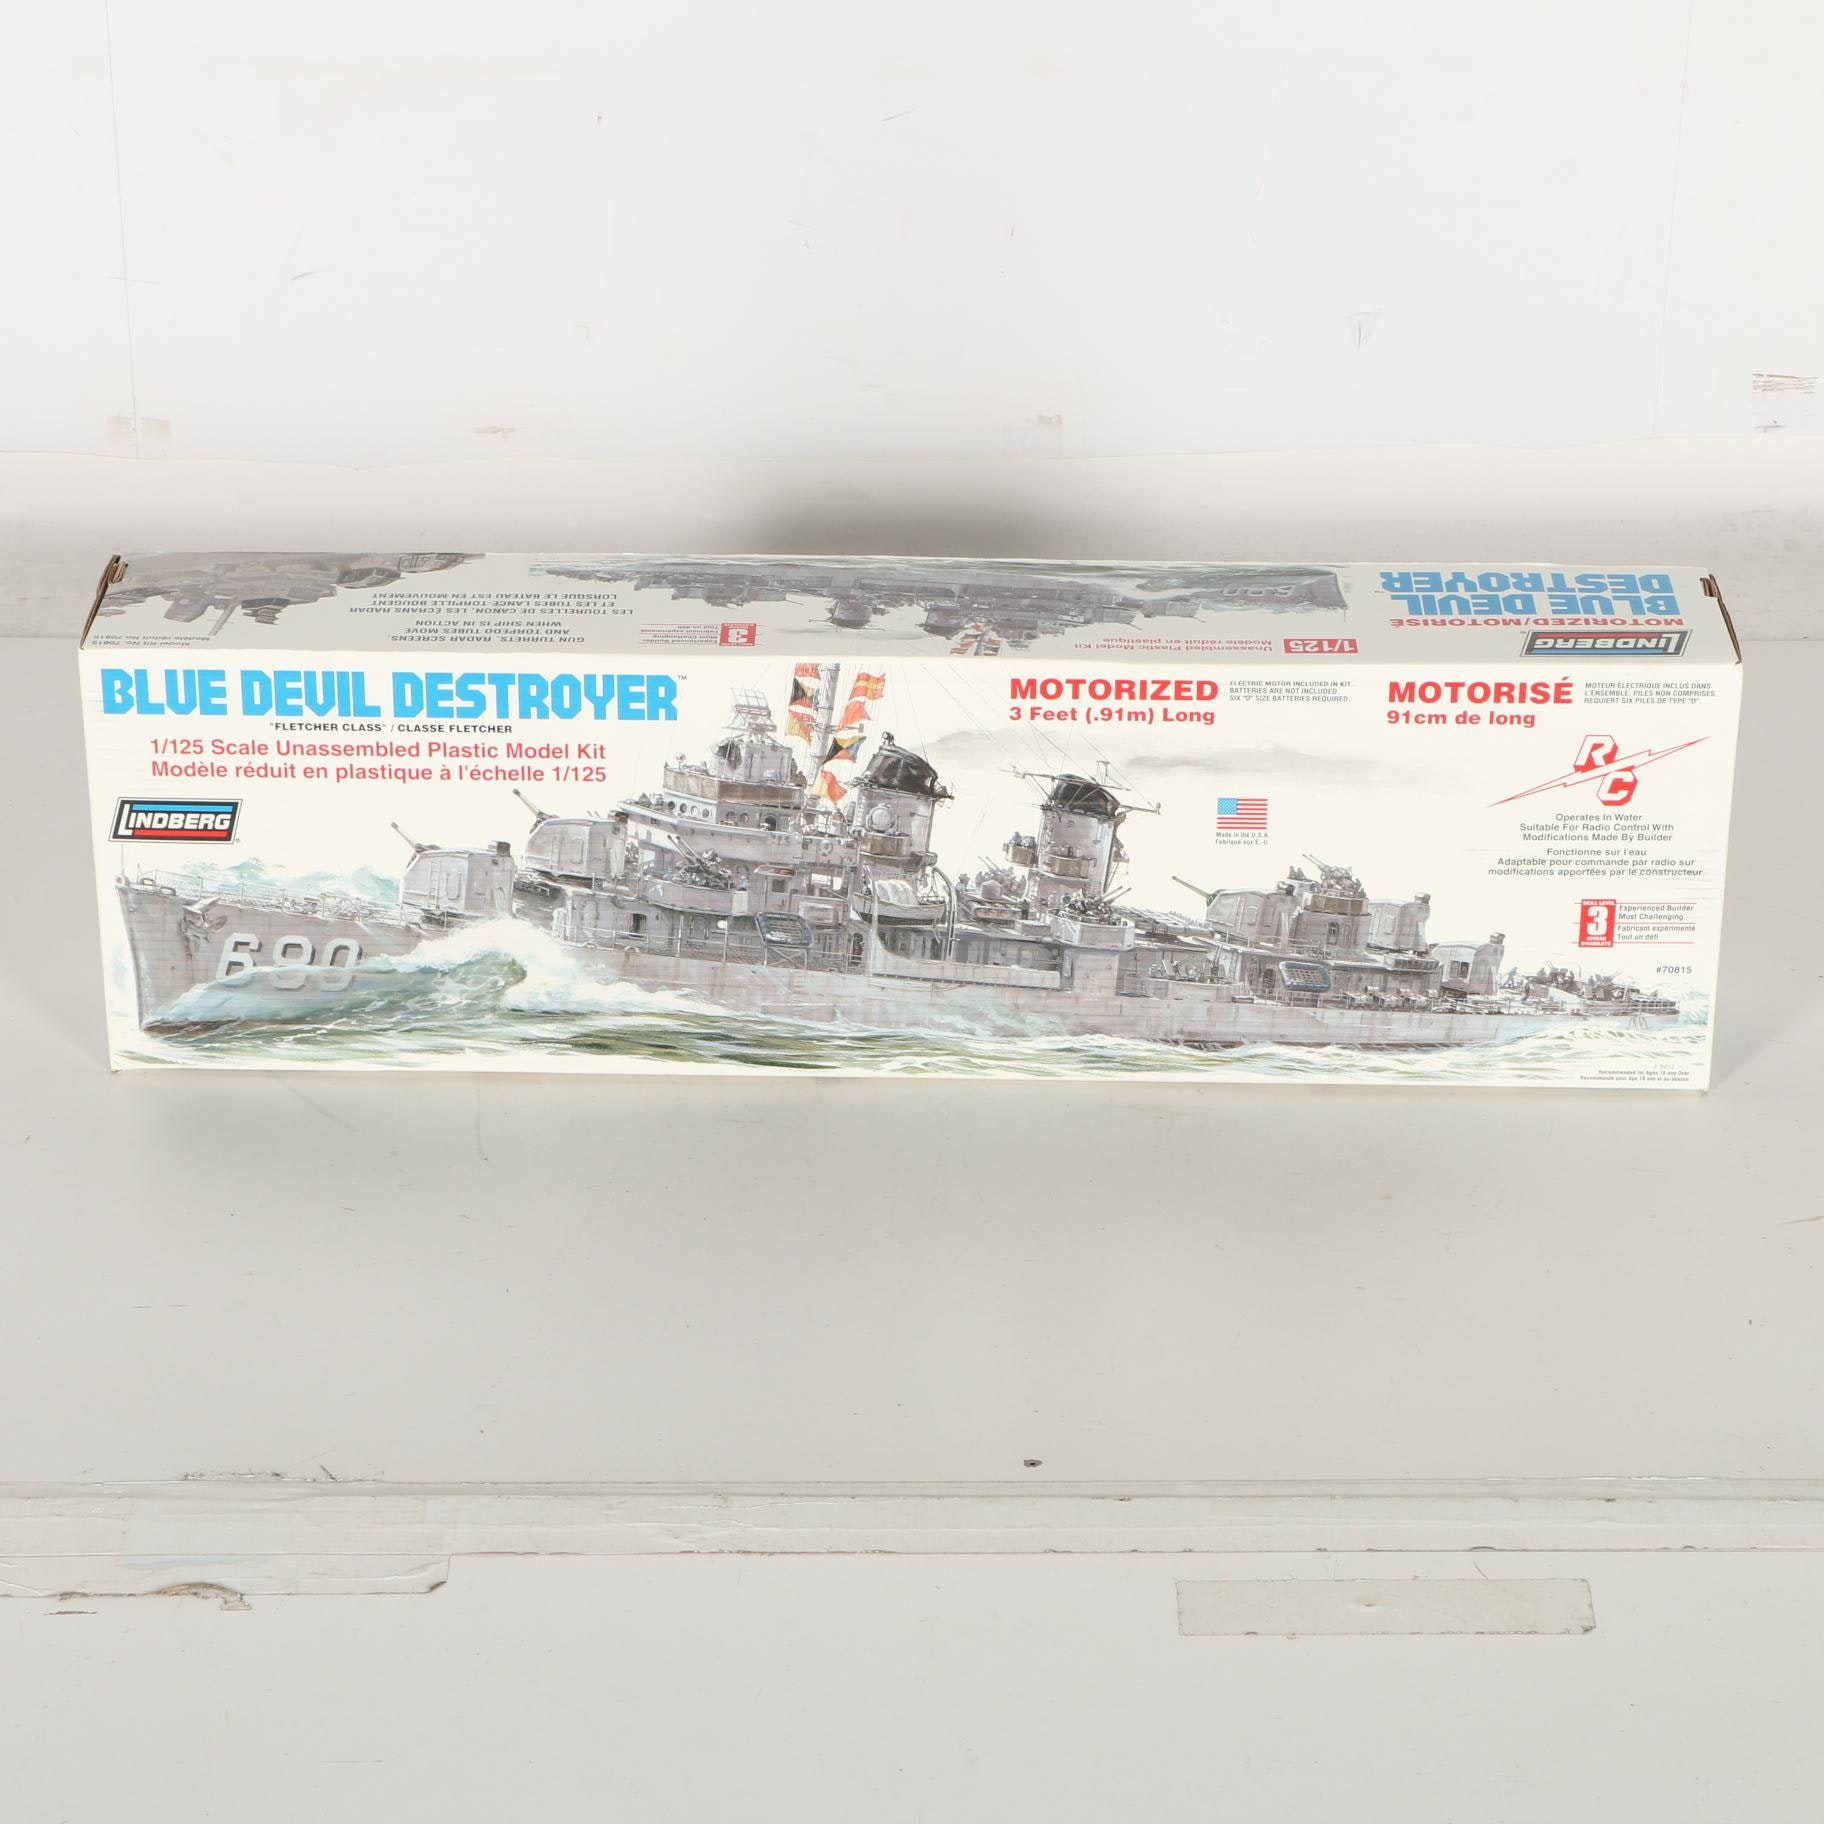 Lindgerg Blue Devil Destroyer 1:125 Scale Model Kit